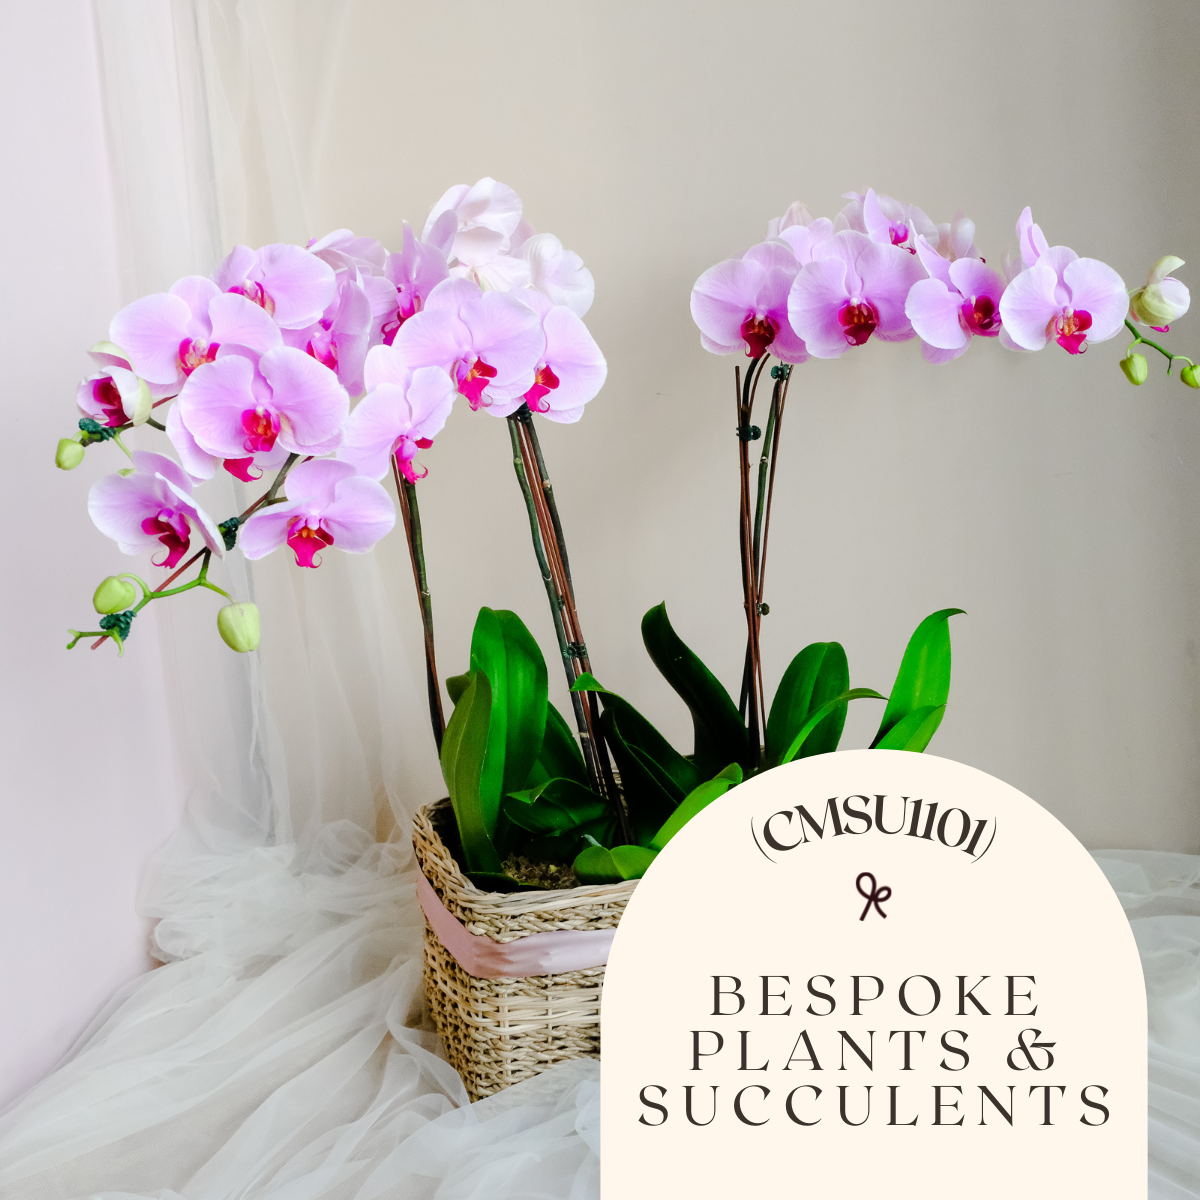 Bespoke Plants & Succulents